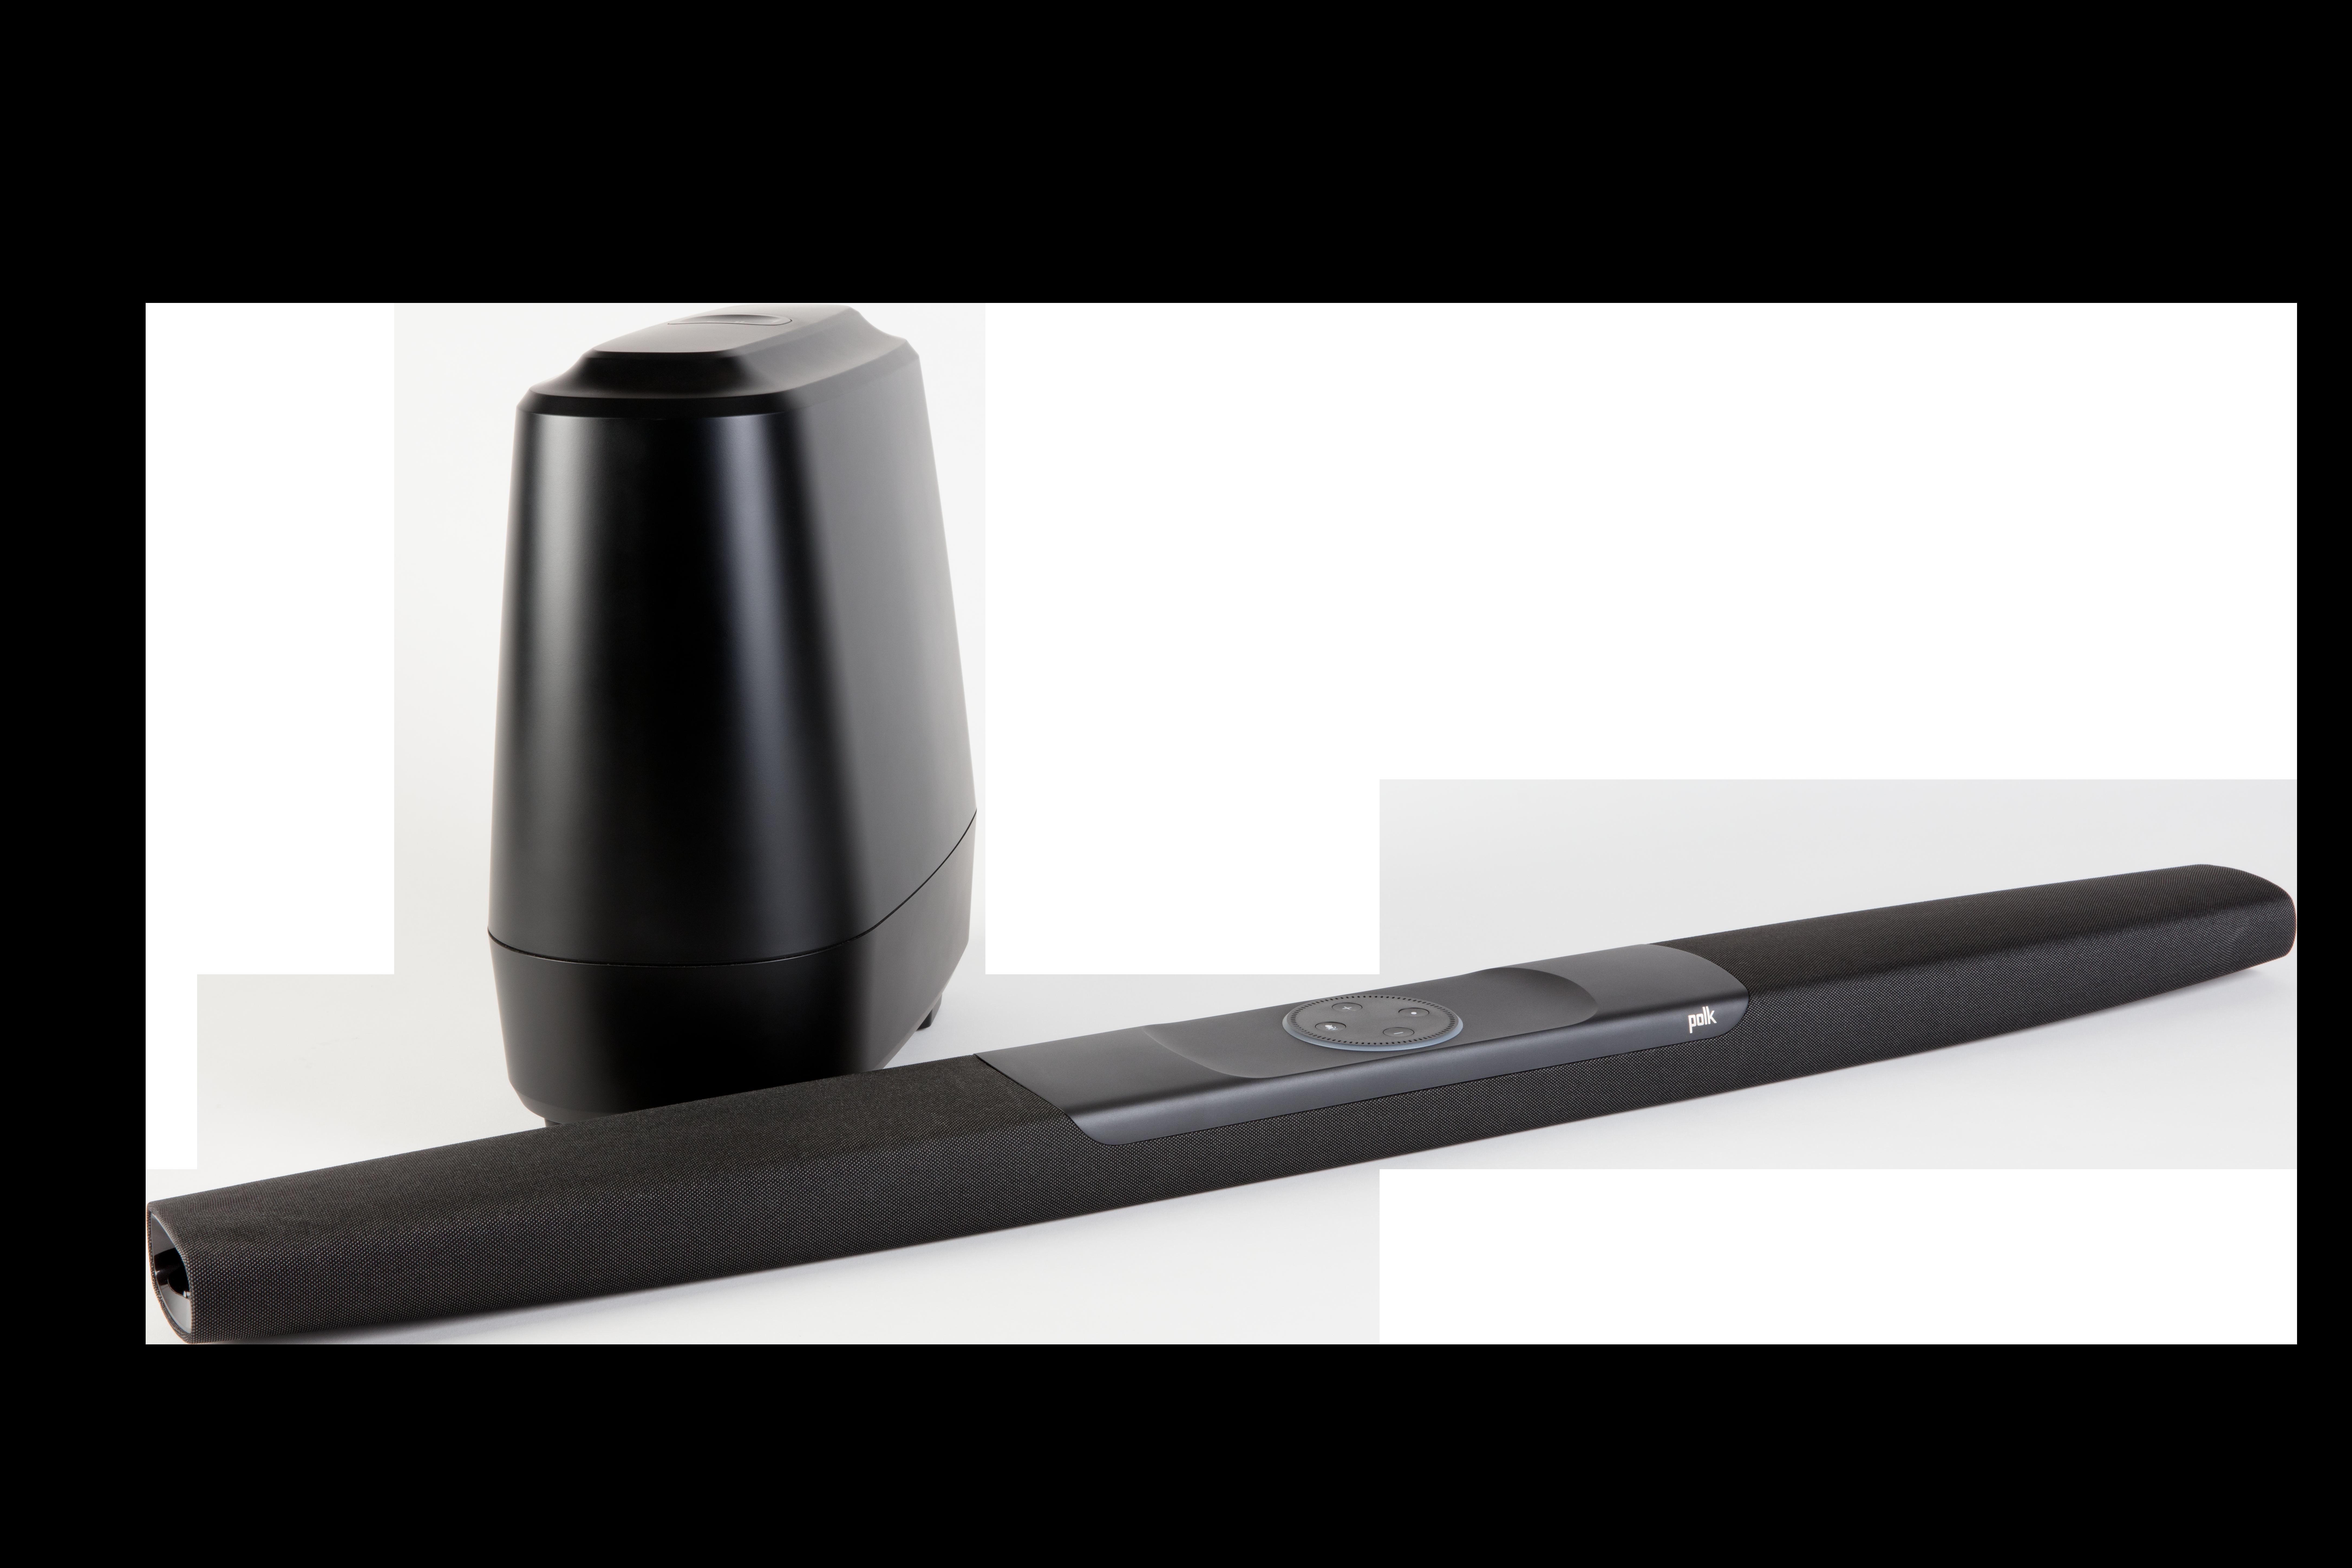 Polk Debuts First Alexa-Powered Soundbar